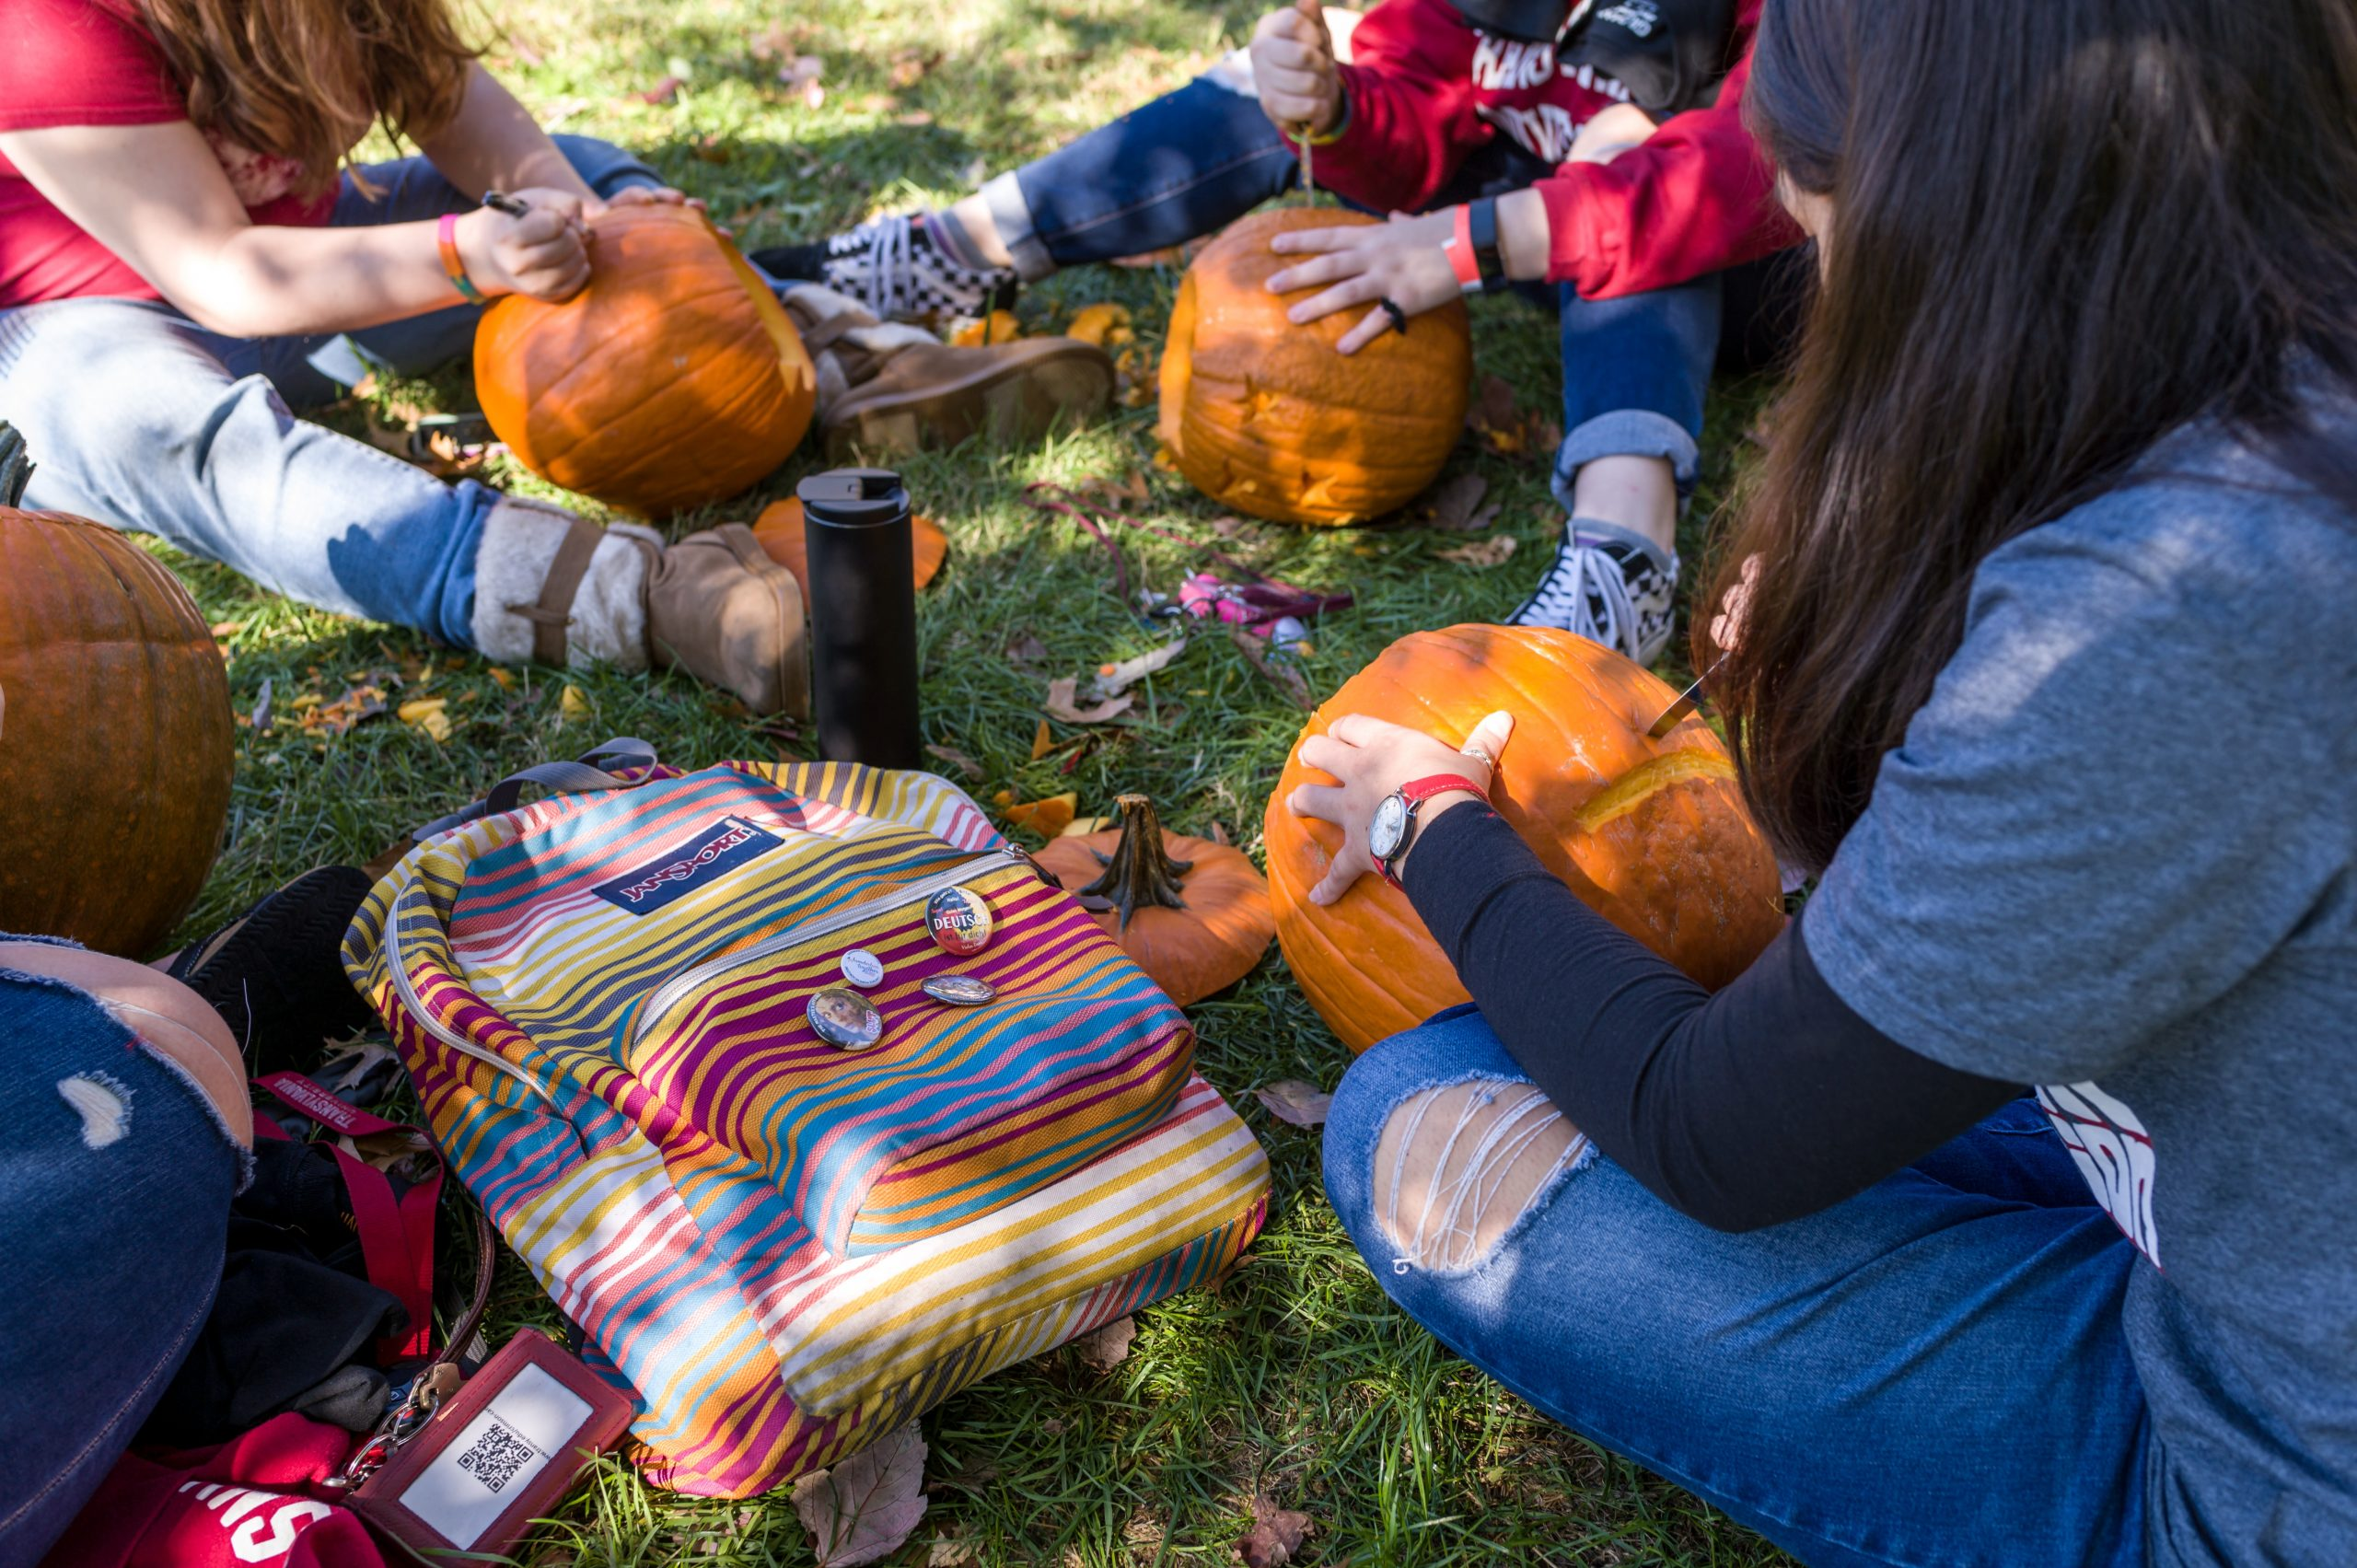 Transylvania's PumpkinMania returns with carving event, jack-o'-lantern display